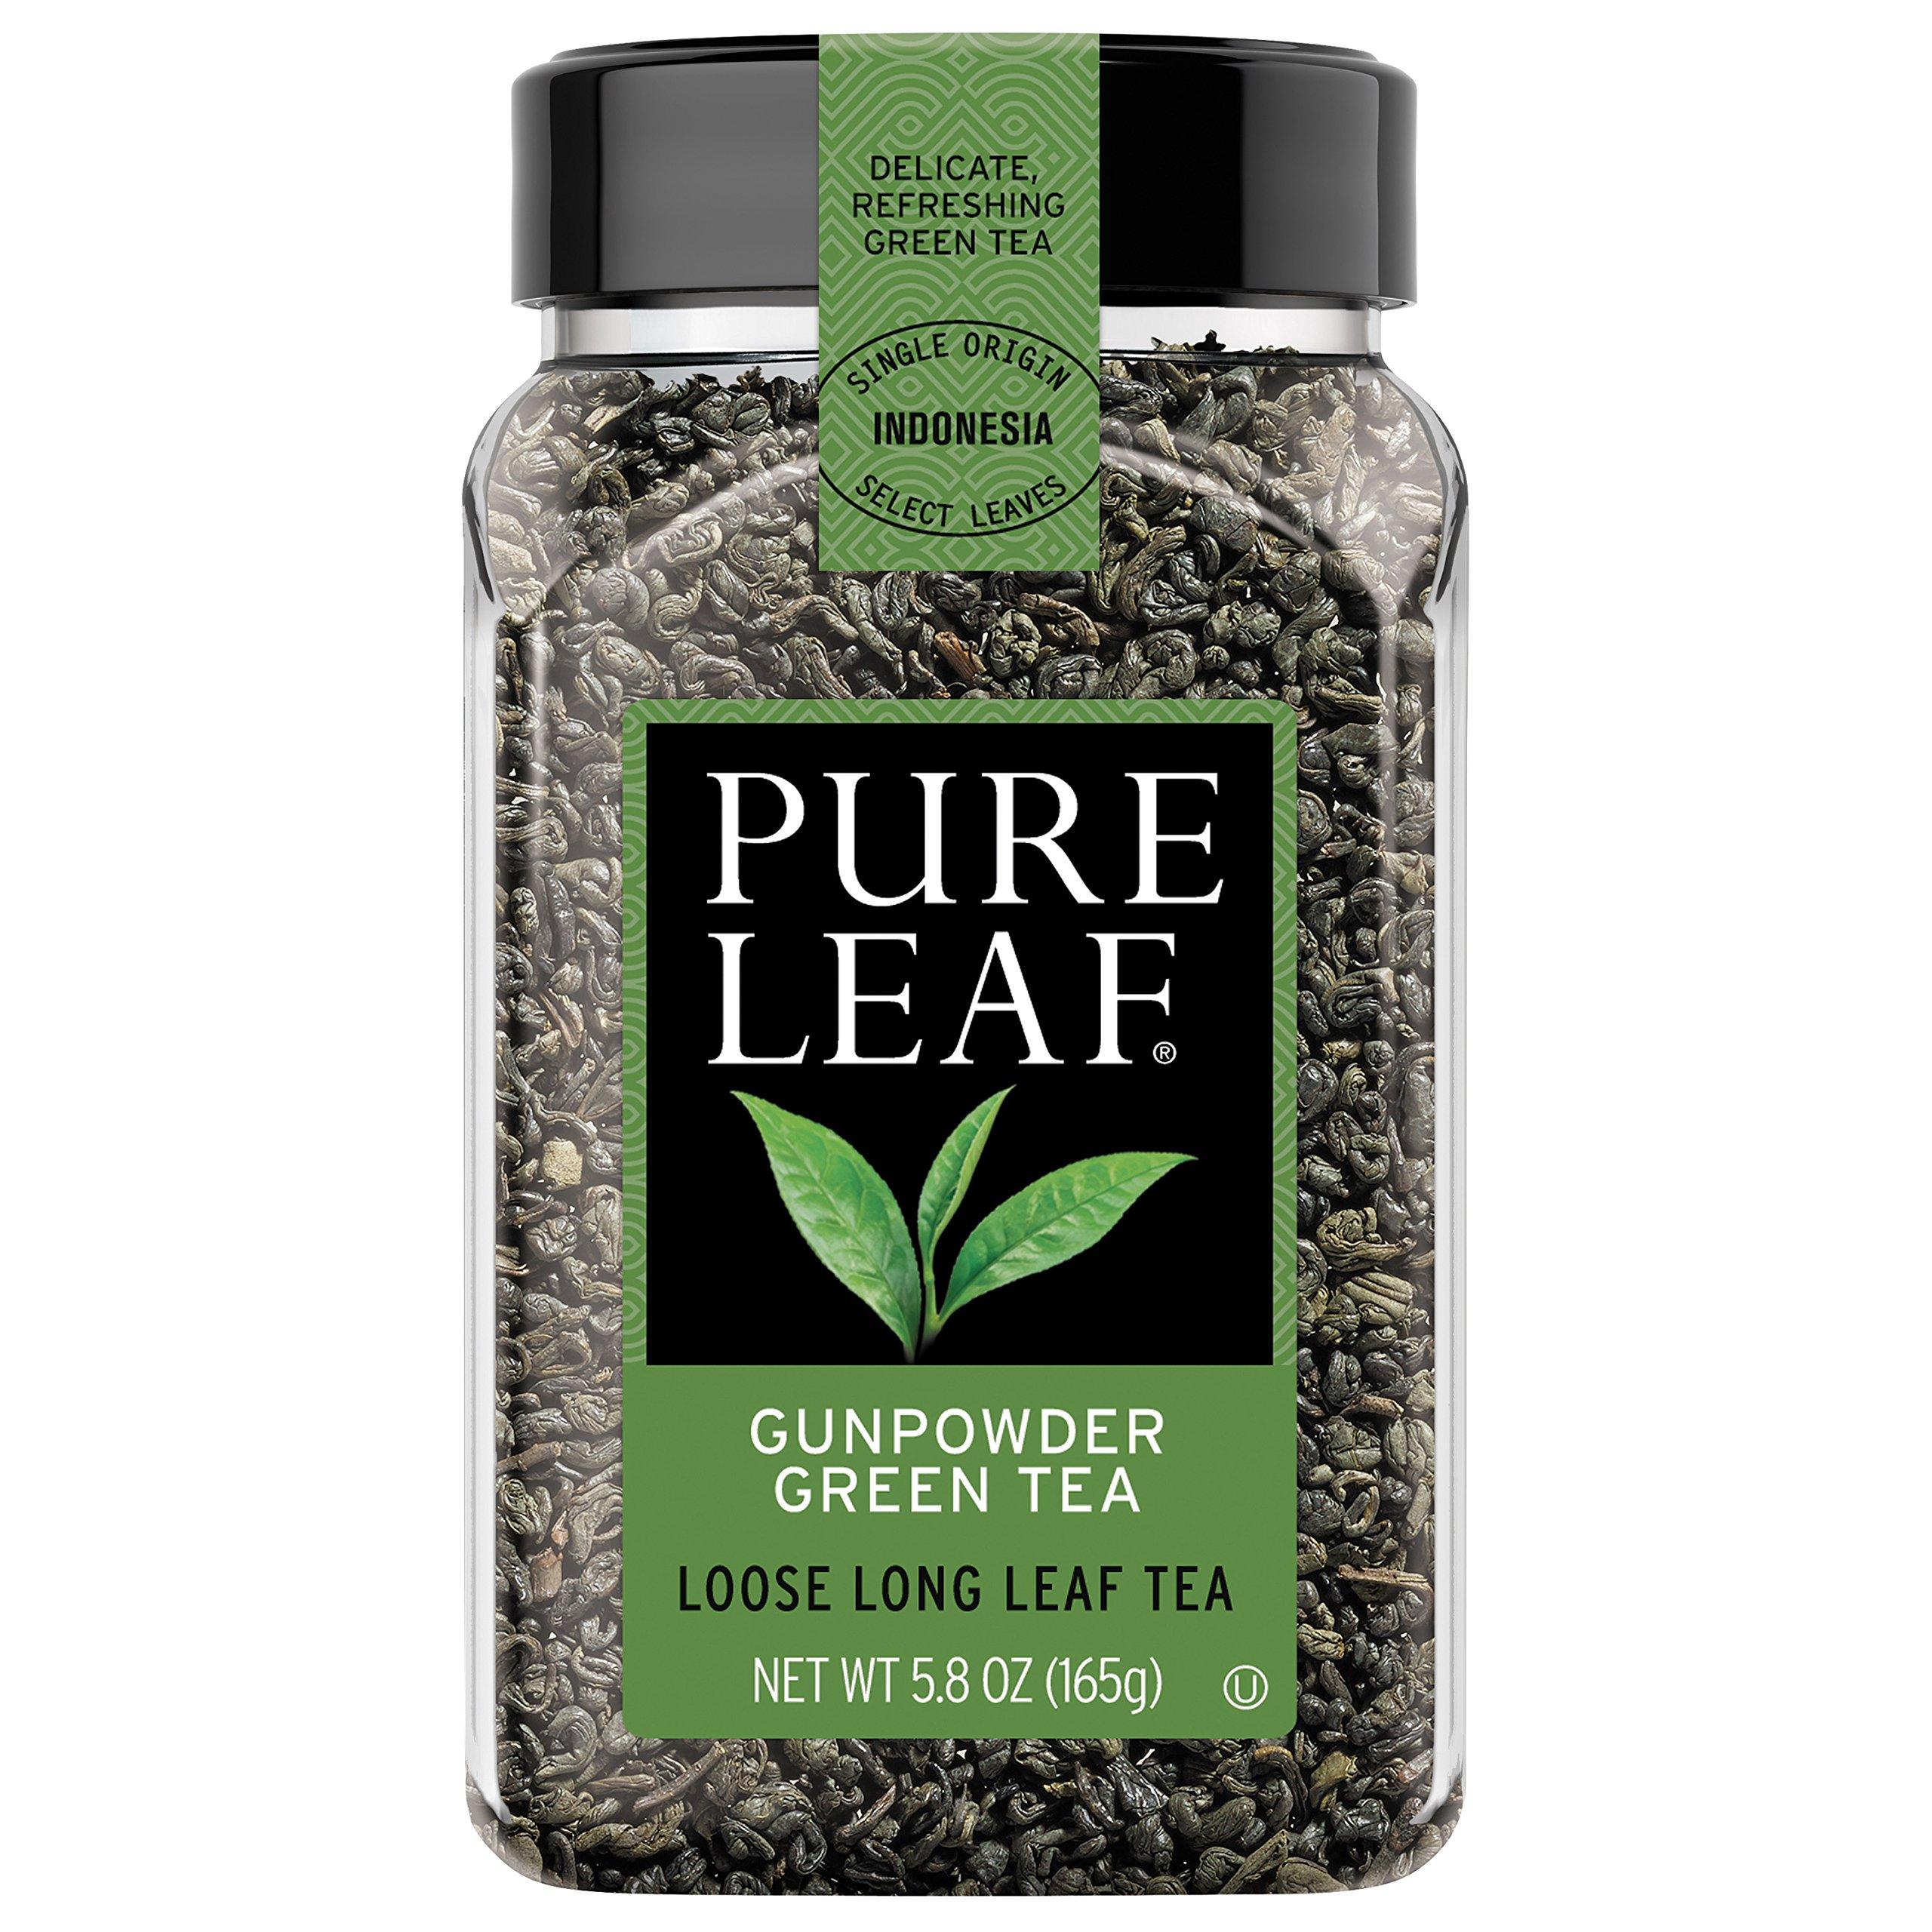 Pure Leaf Hot Loose Tea Gunpowder Green Tea 5.8 oz, pack of 6 by Pure Leaf